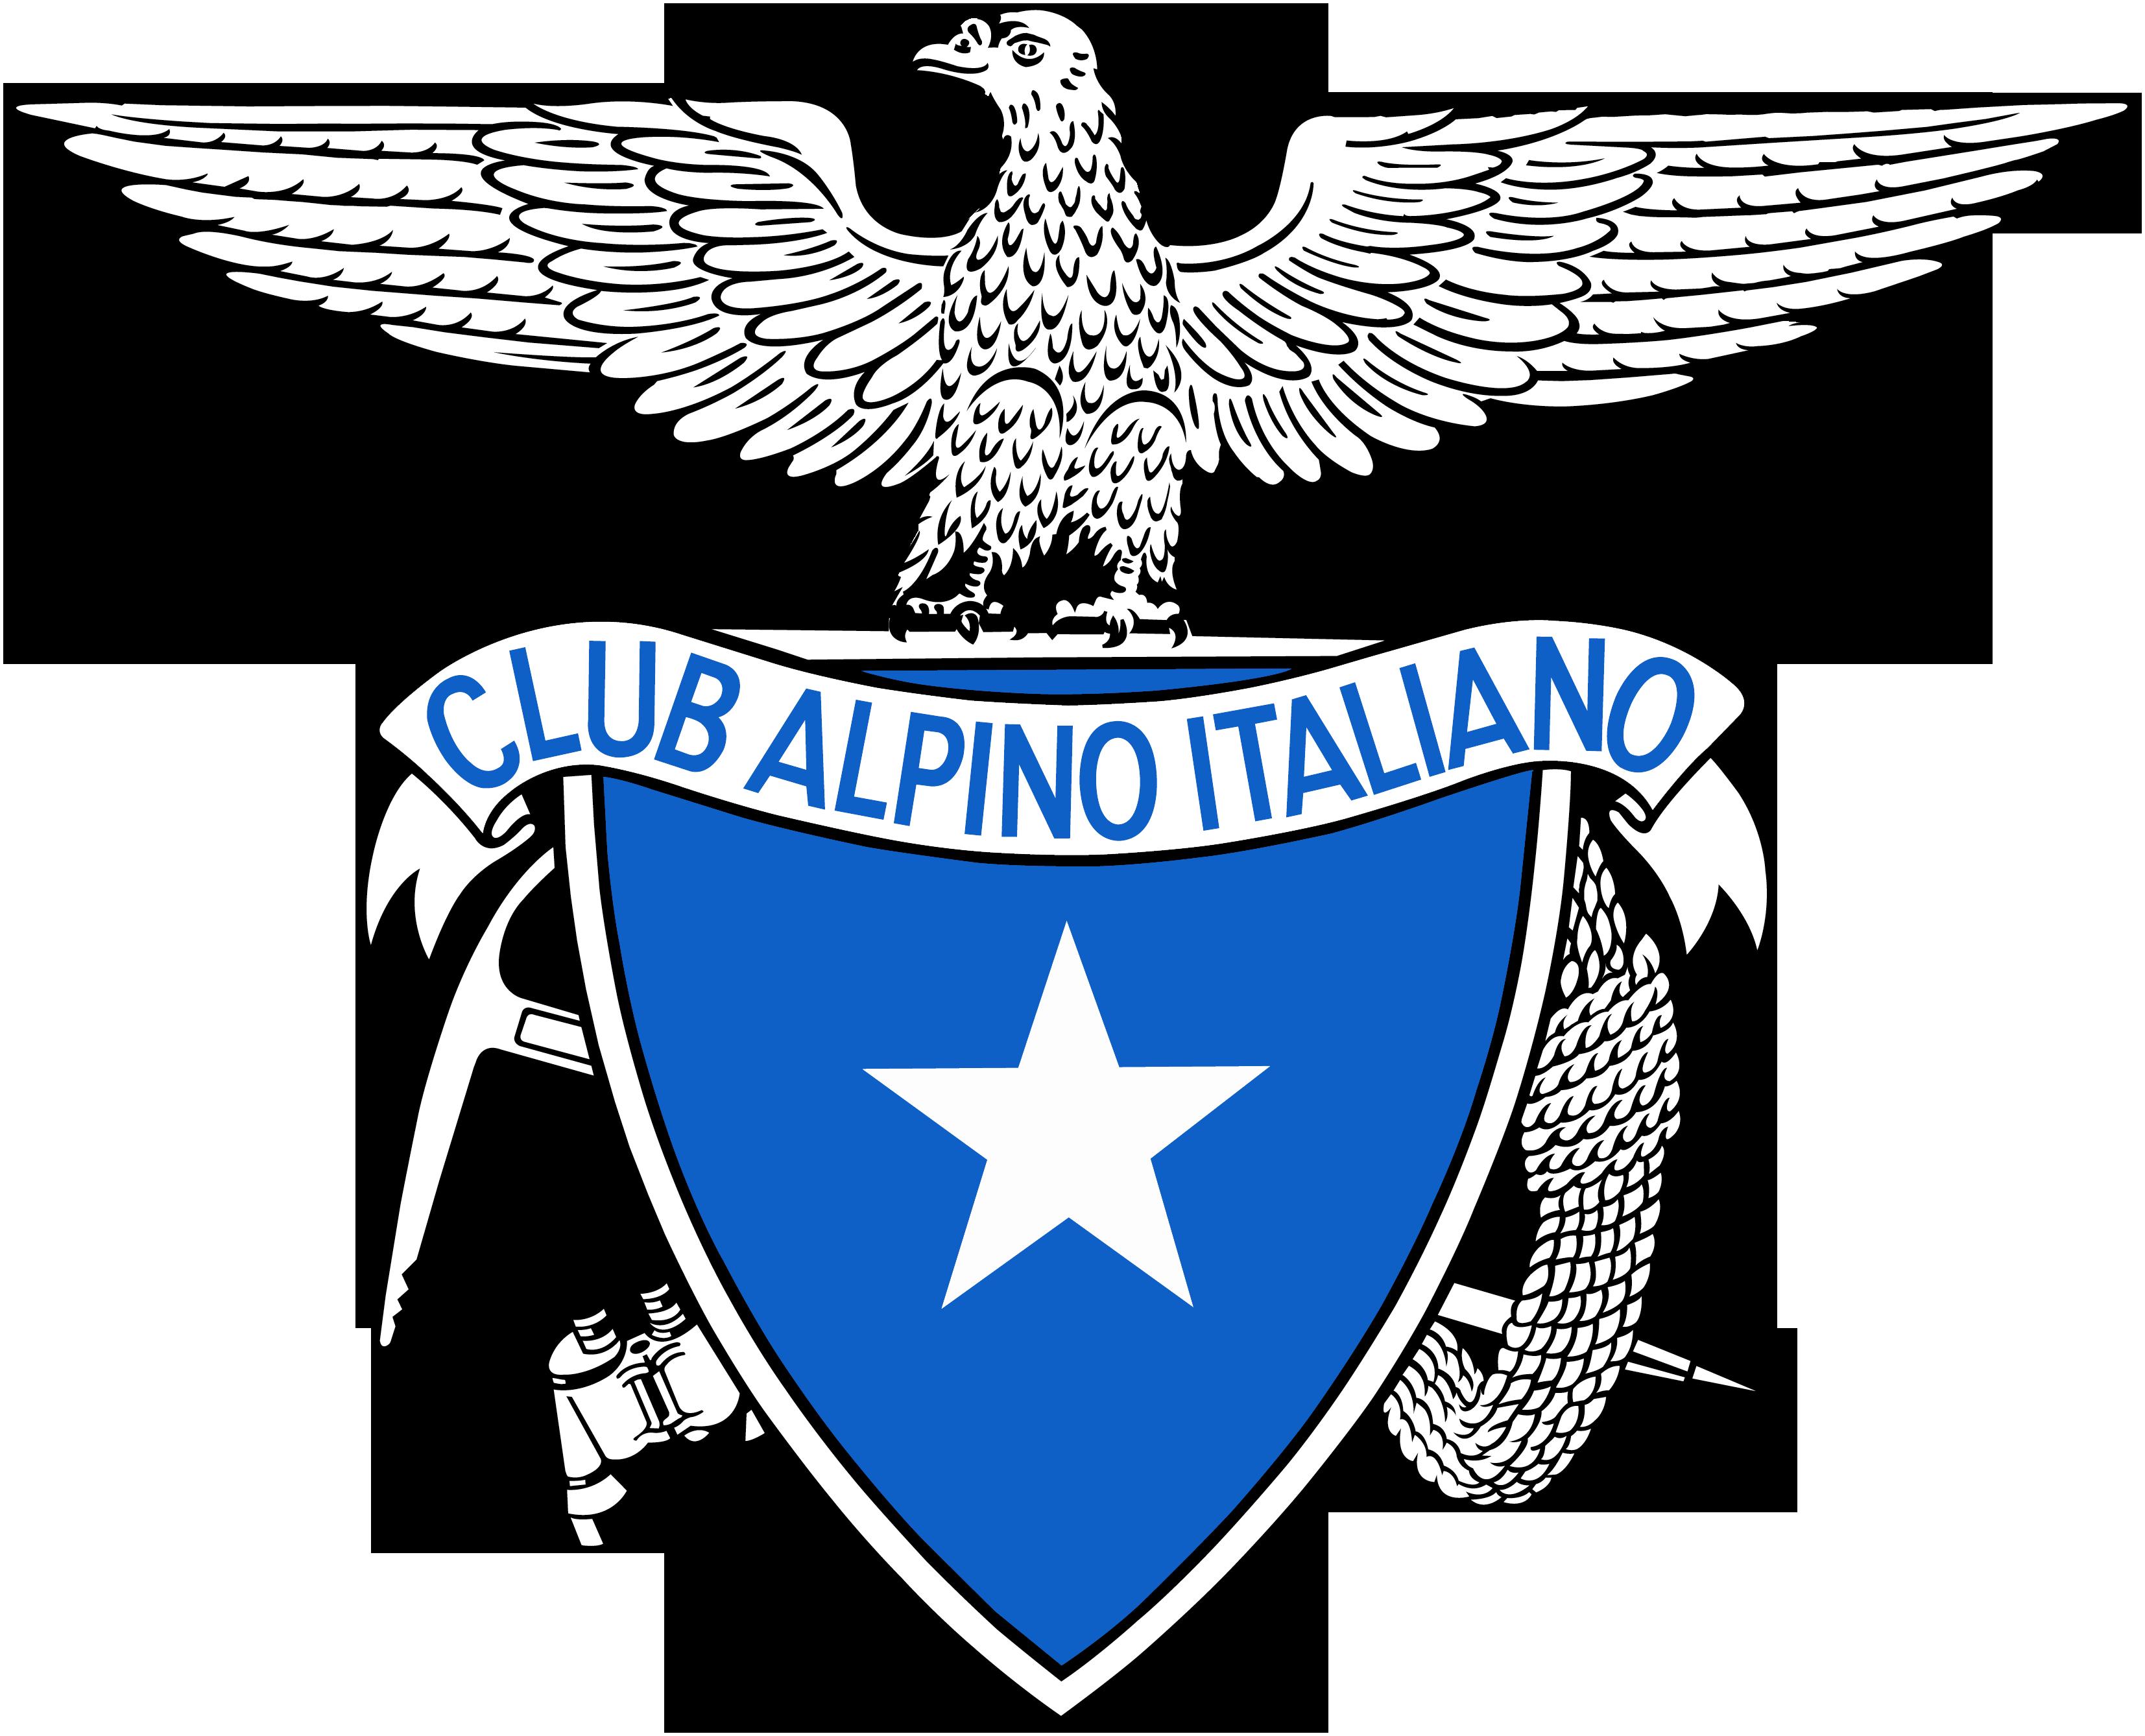 http://upload.wikimedia.org/wikipedia/commons/d/d9/Cai_Club_Alpino_Italiano_Stemma.png